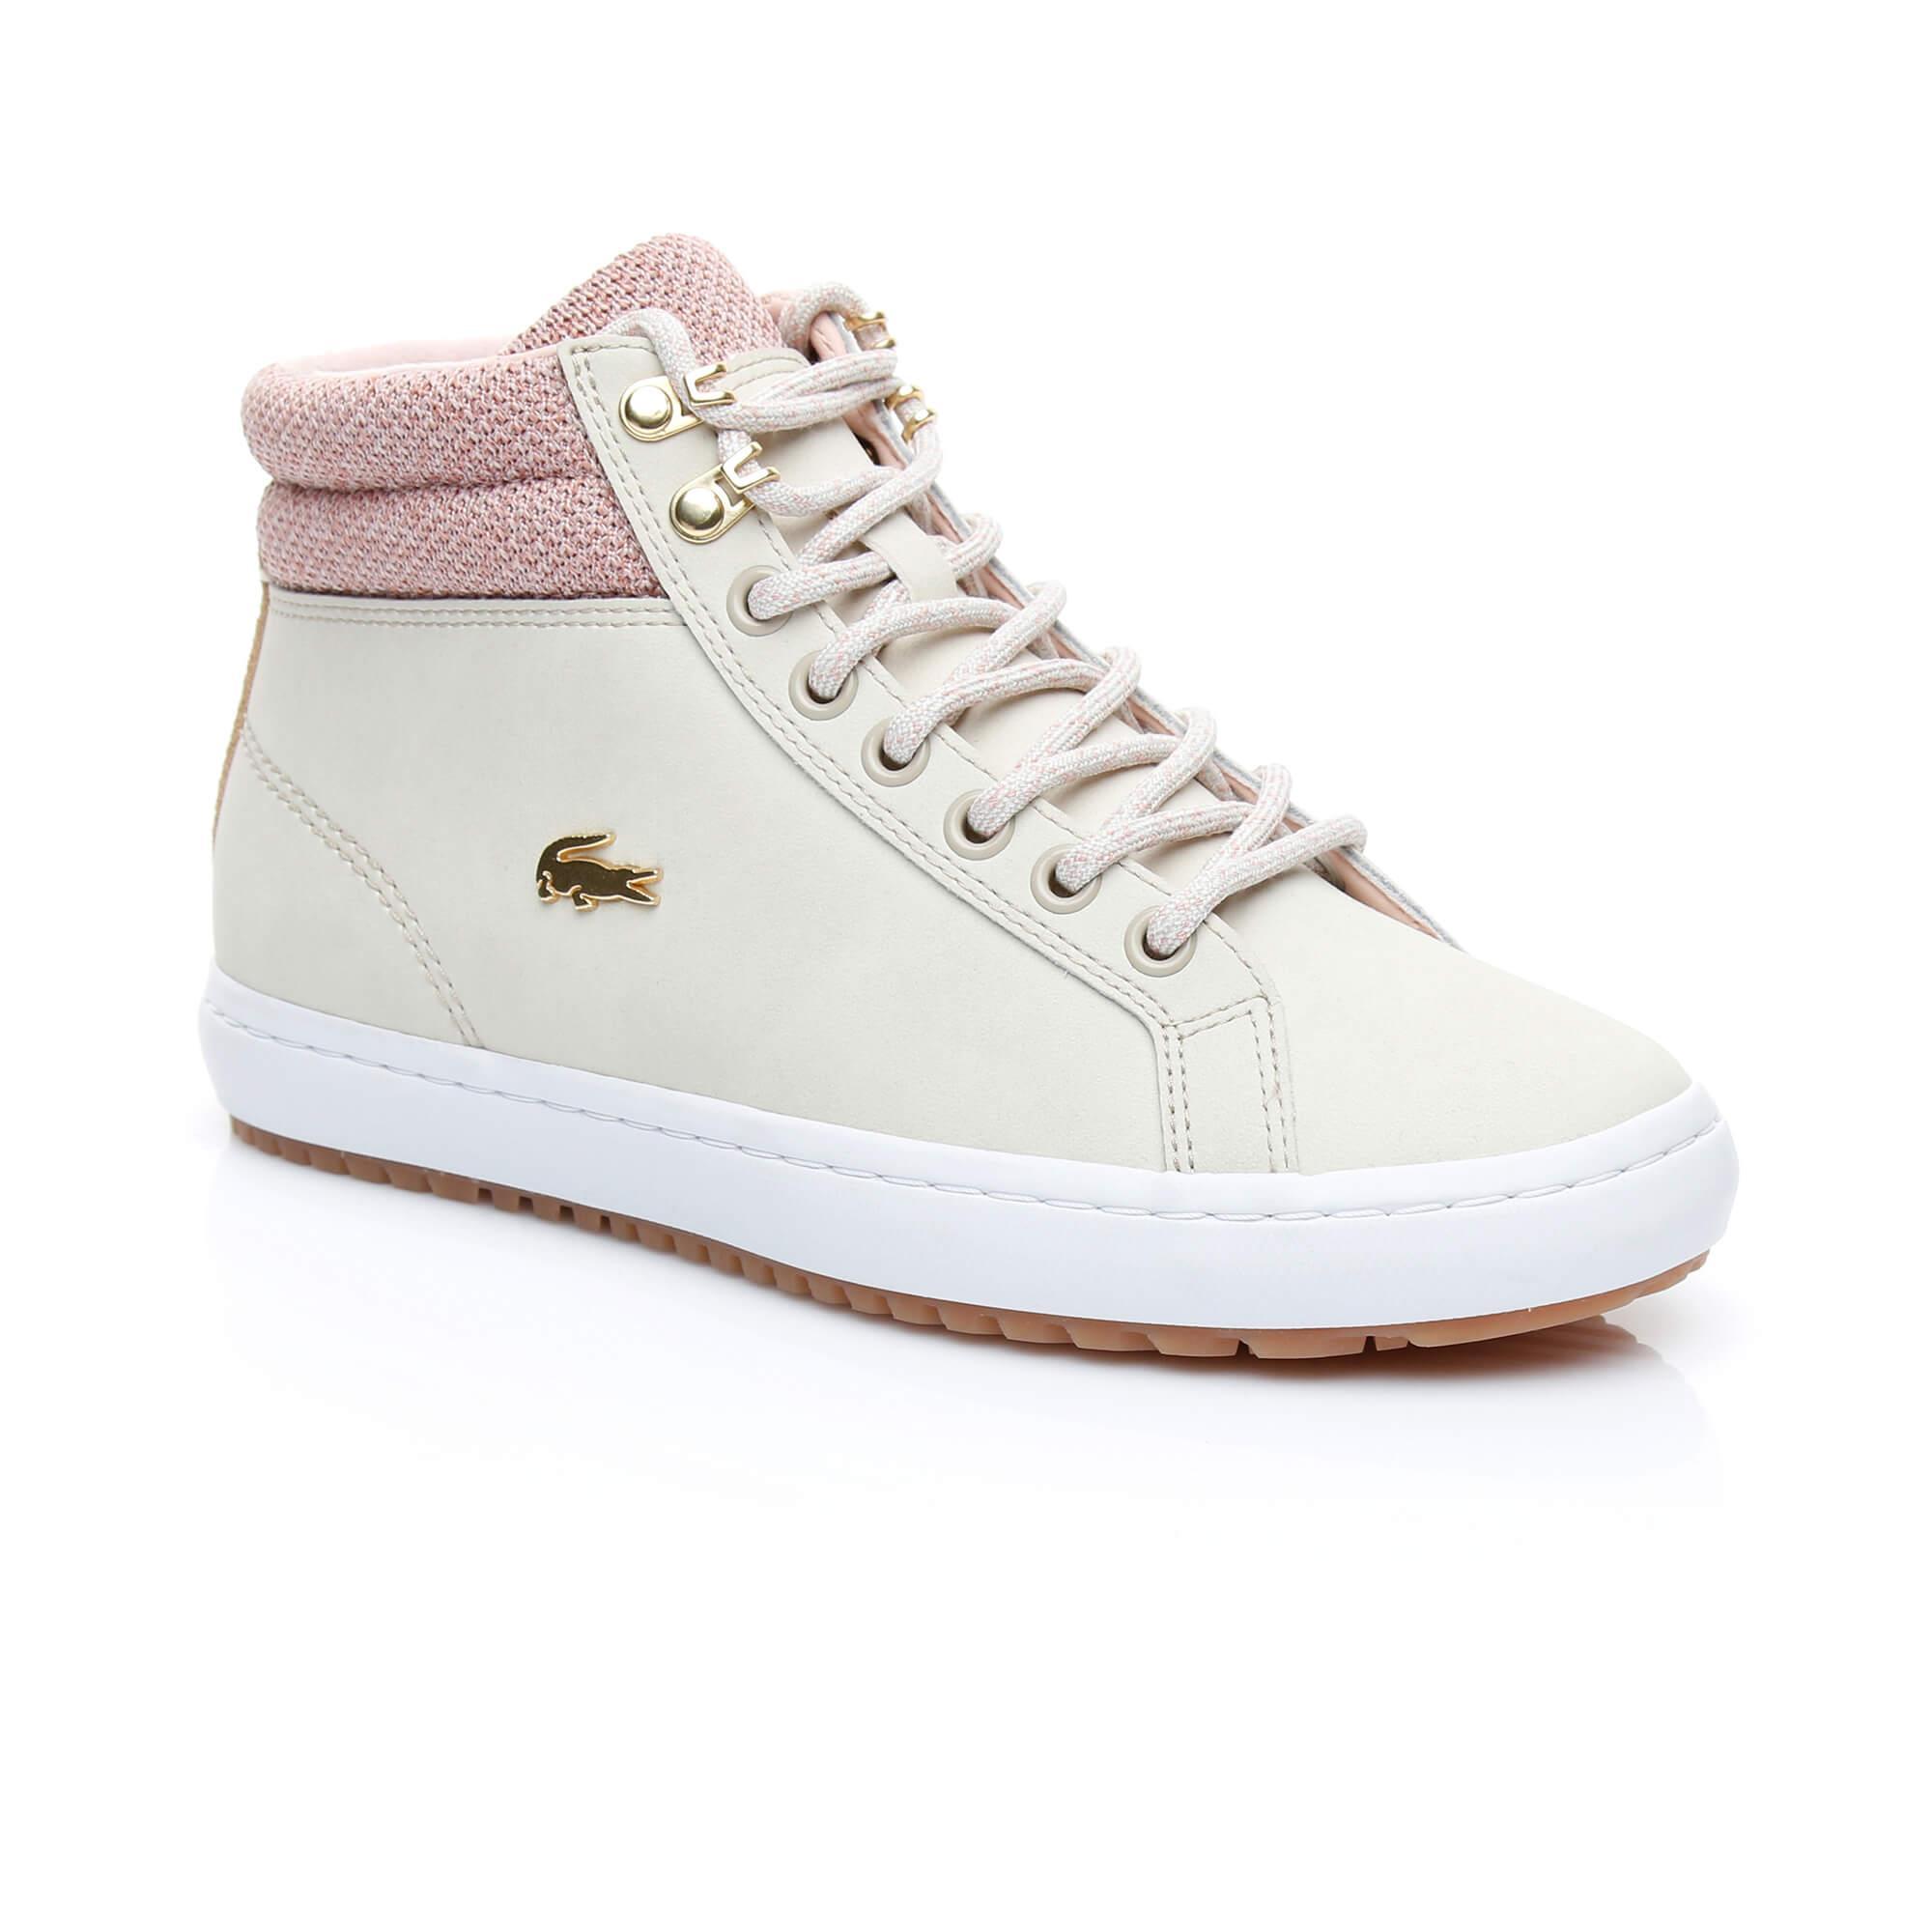 Lacoste черевики жіночі Straightset